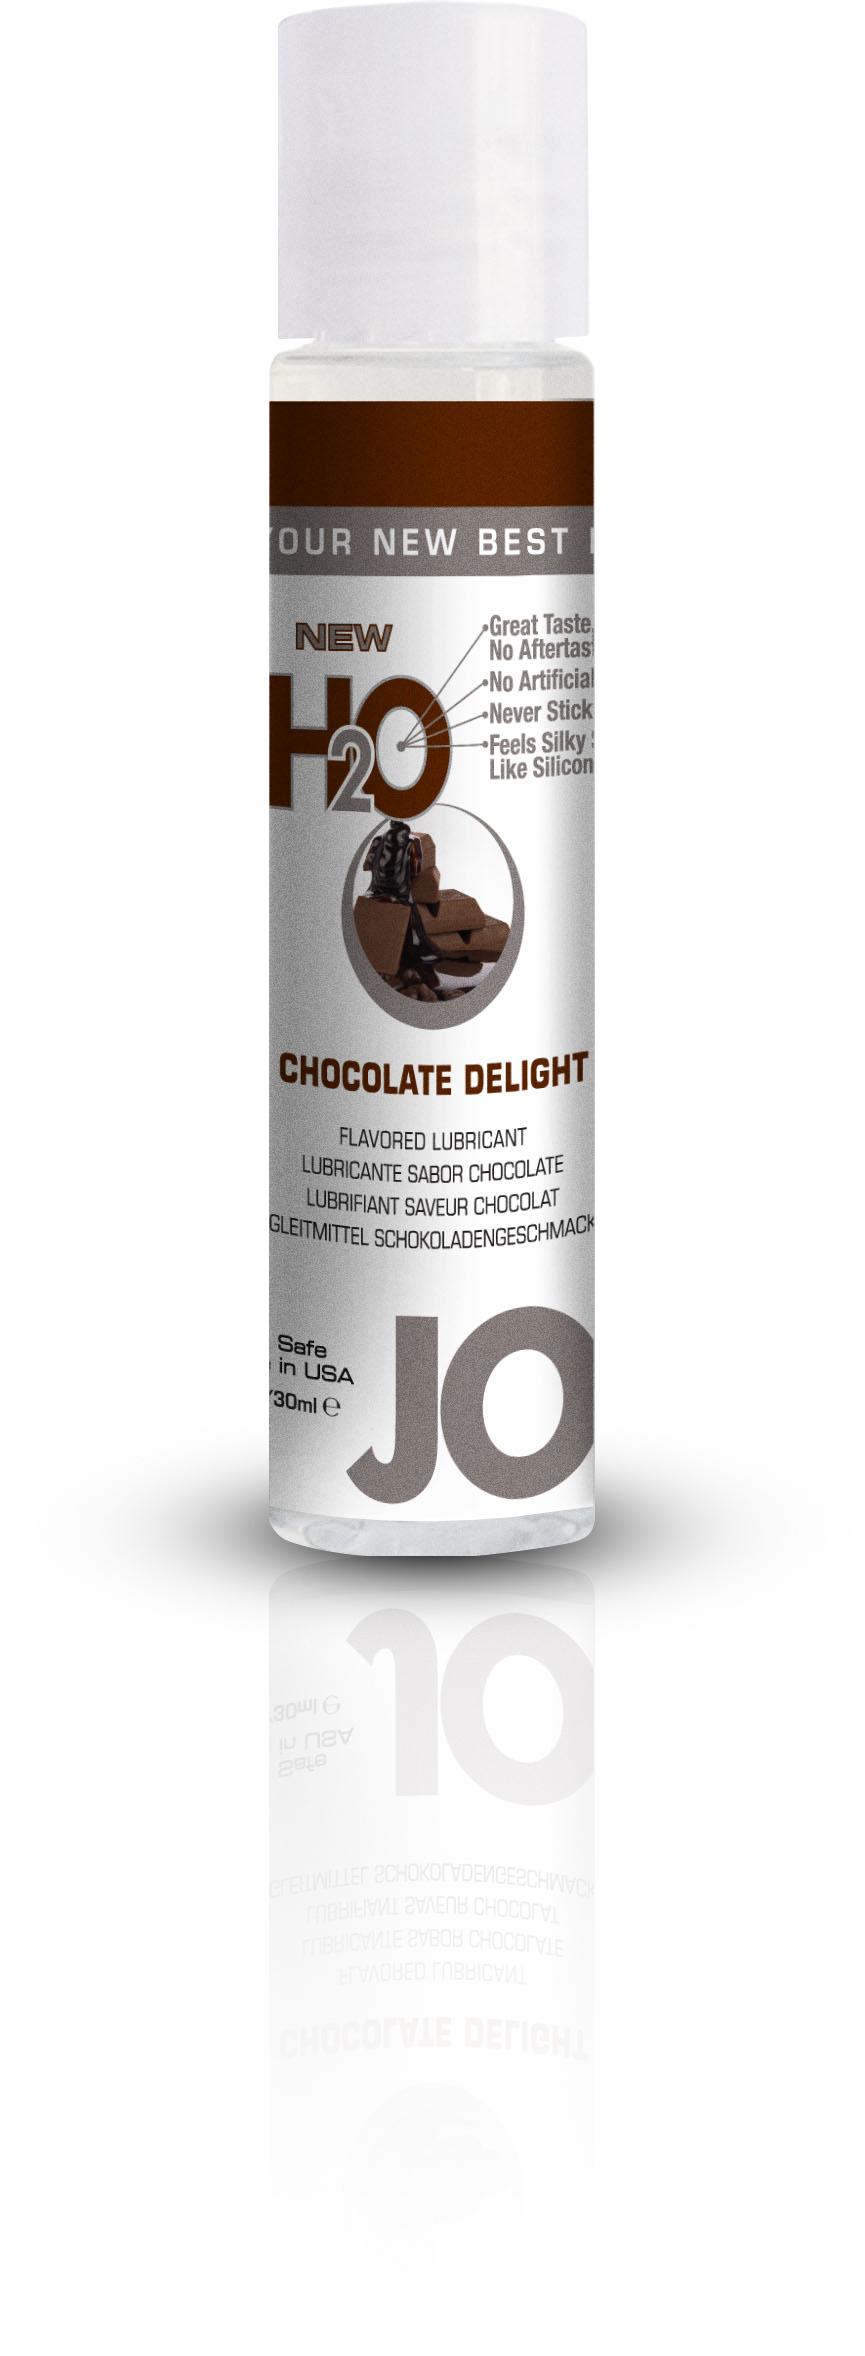 30124_JO_h2o_flavored_lubricant_1oz_1oz_chocolate.jpg